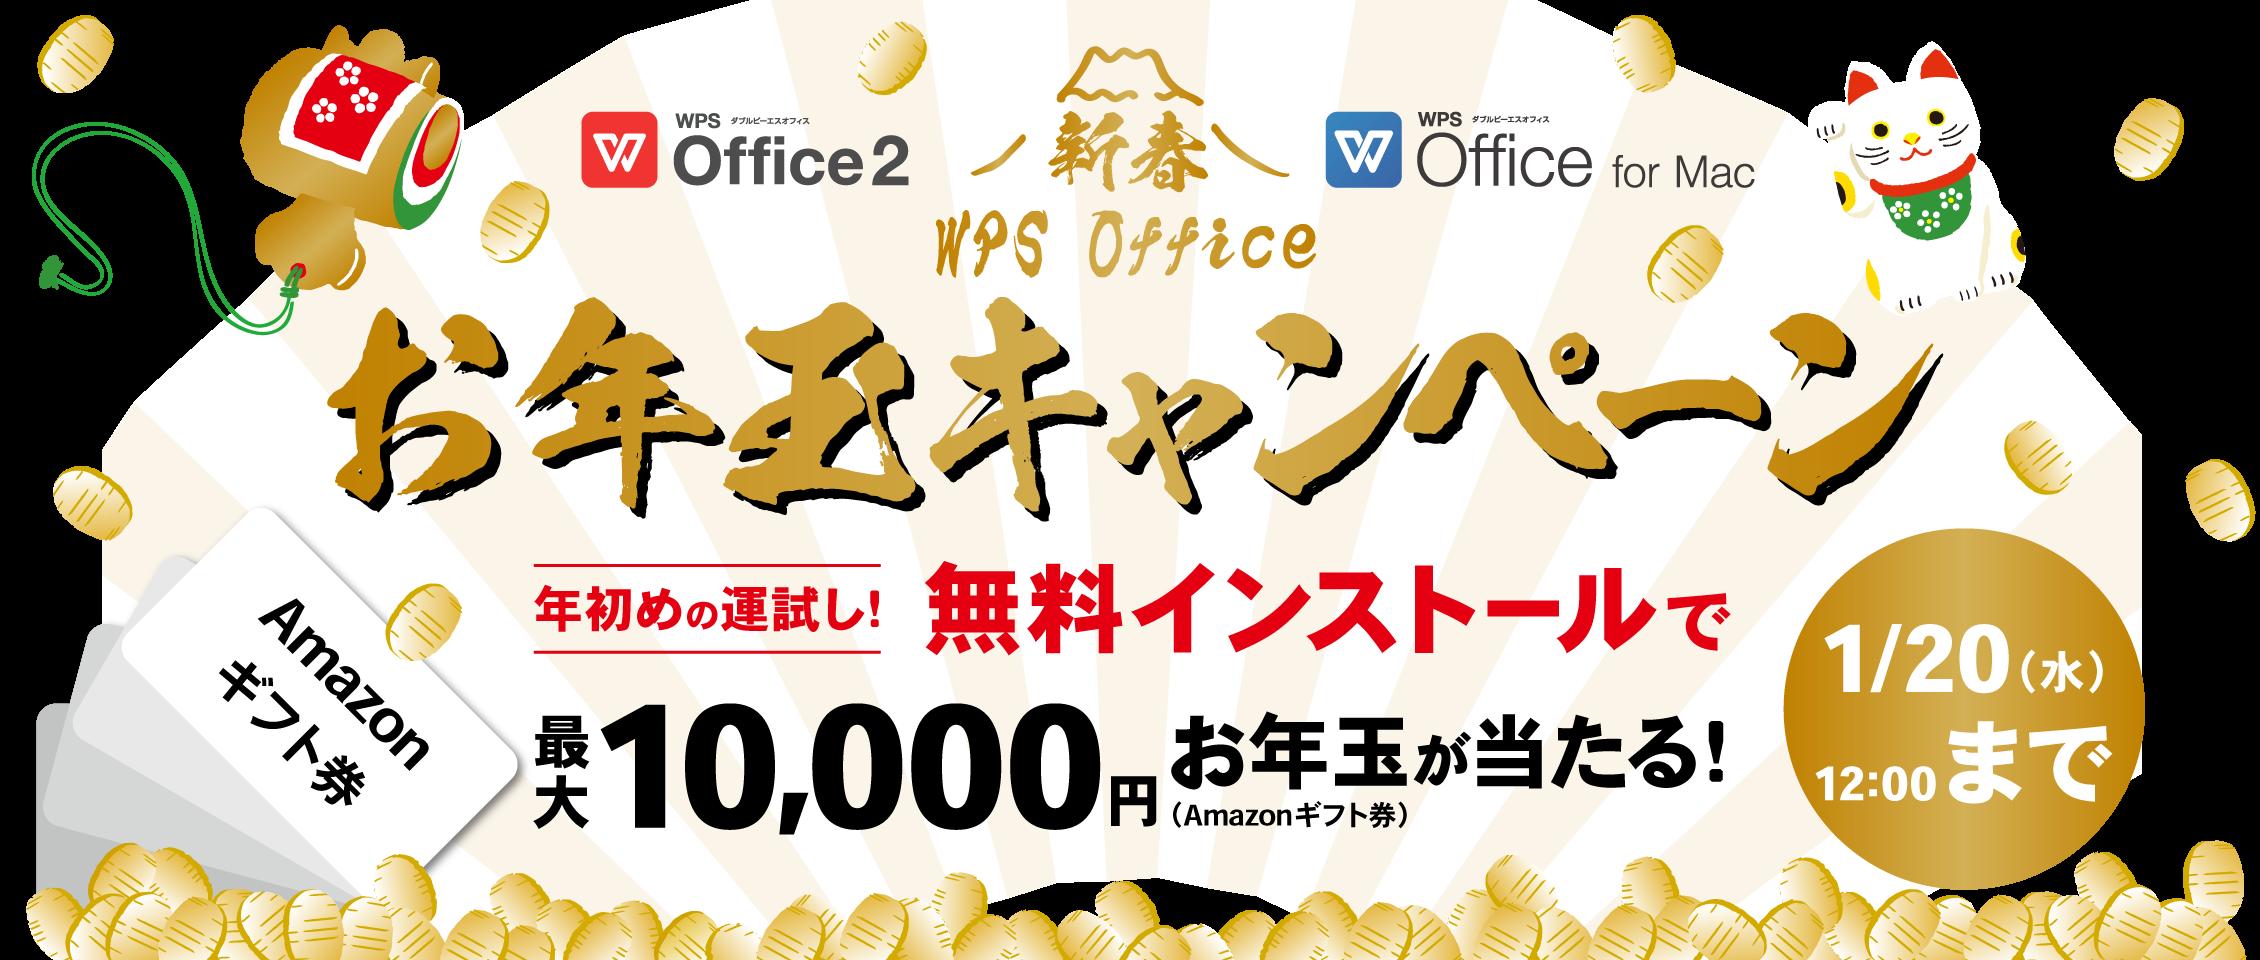 WPS Office インストールキャンペーン